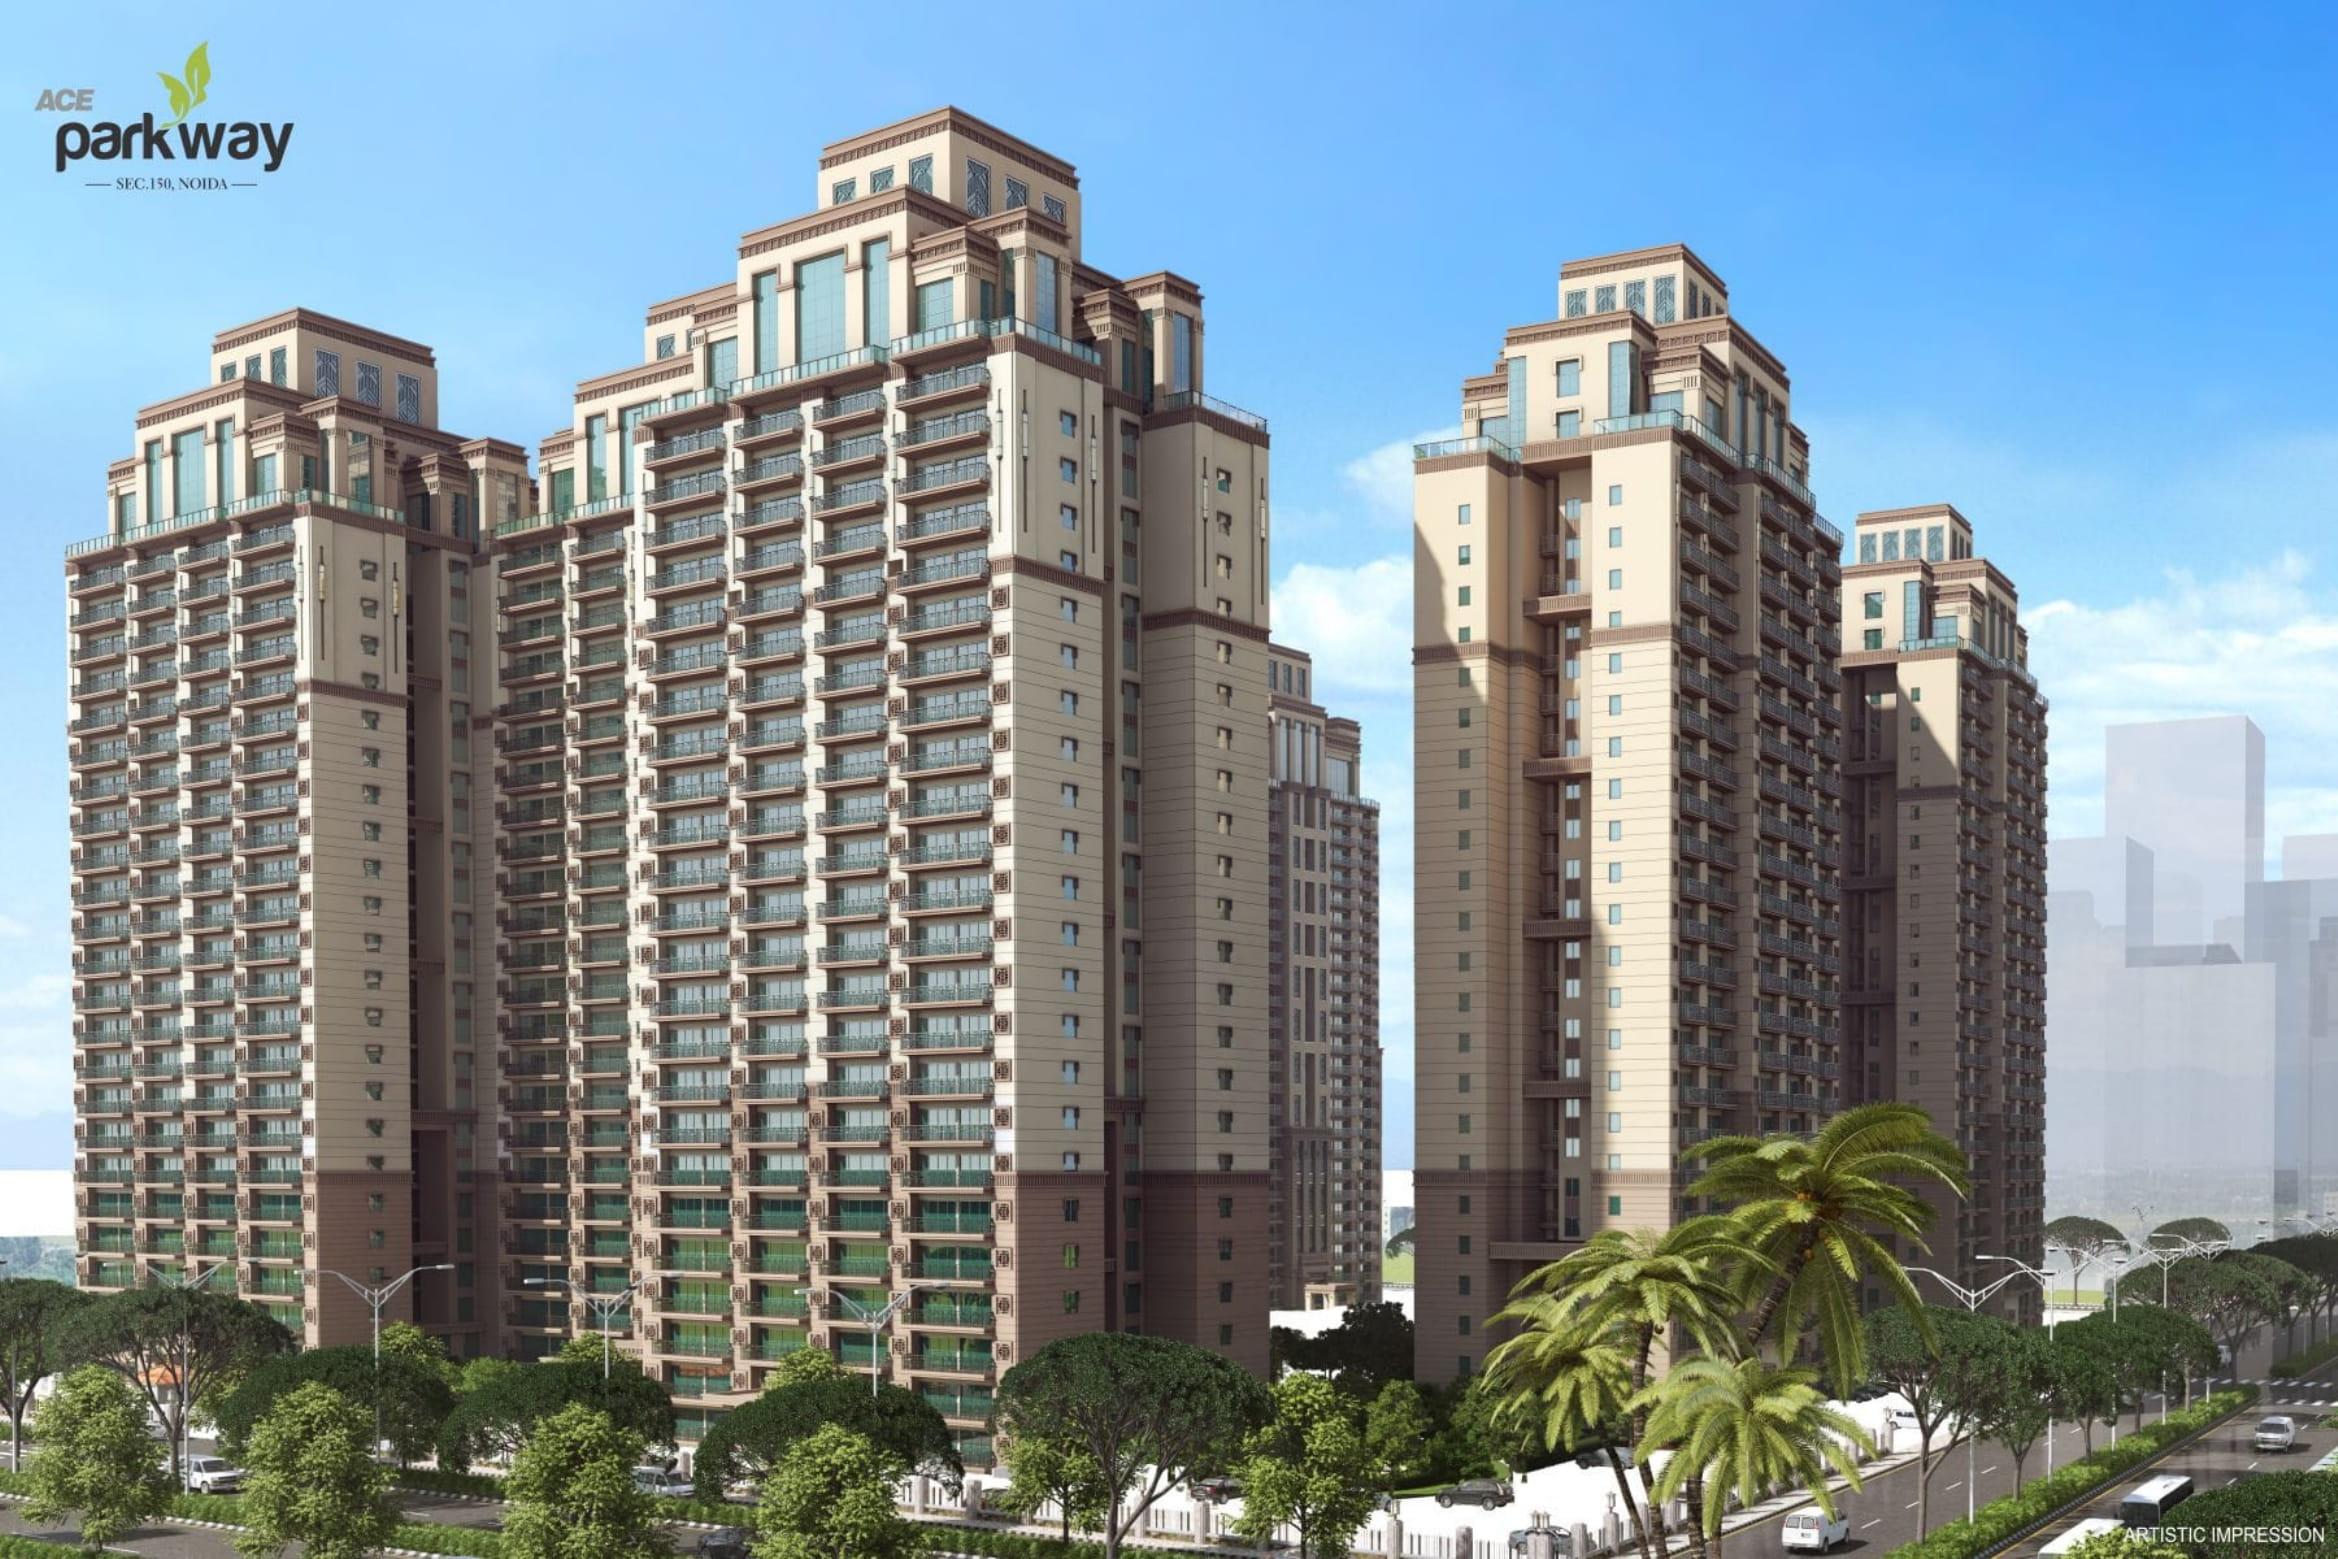 Ace Parkway 2/3BHK Luxury Flats in Sec-150 Noida